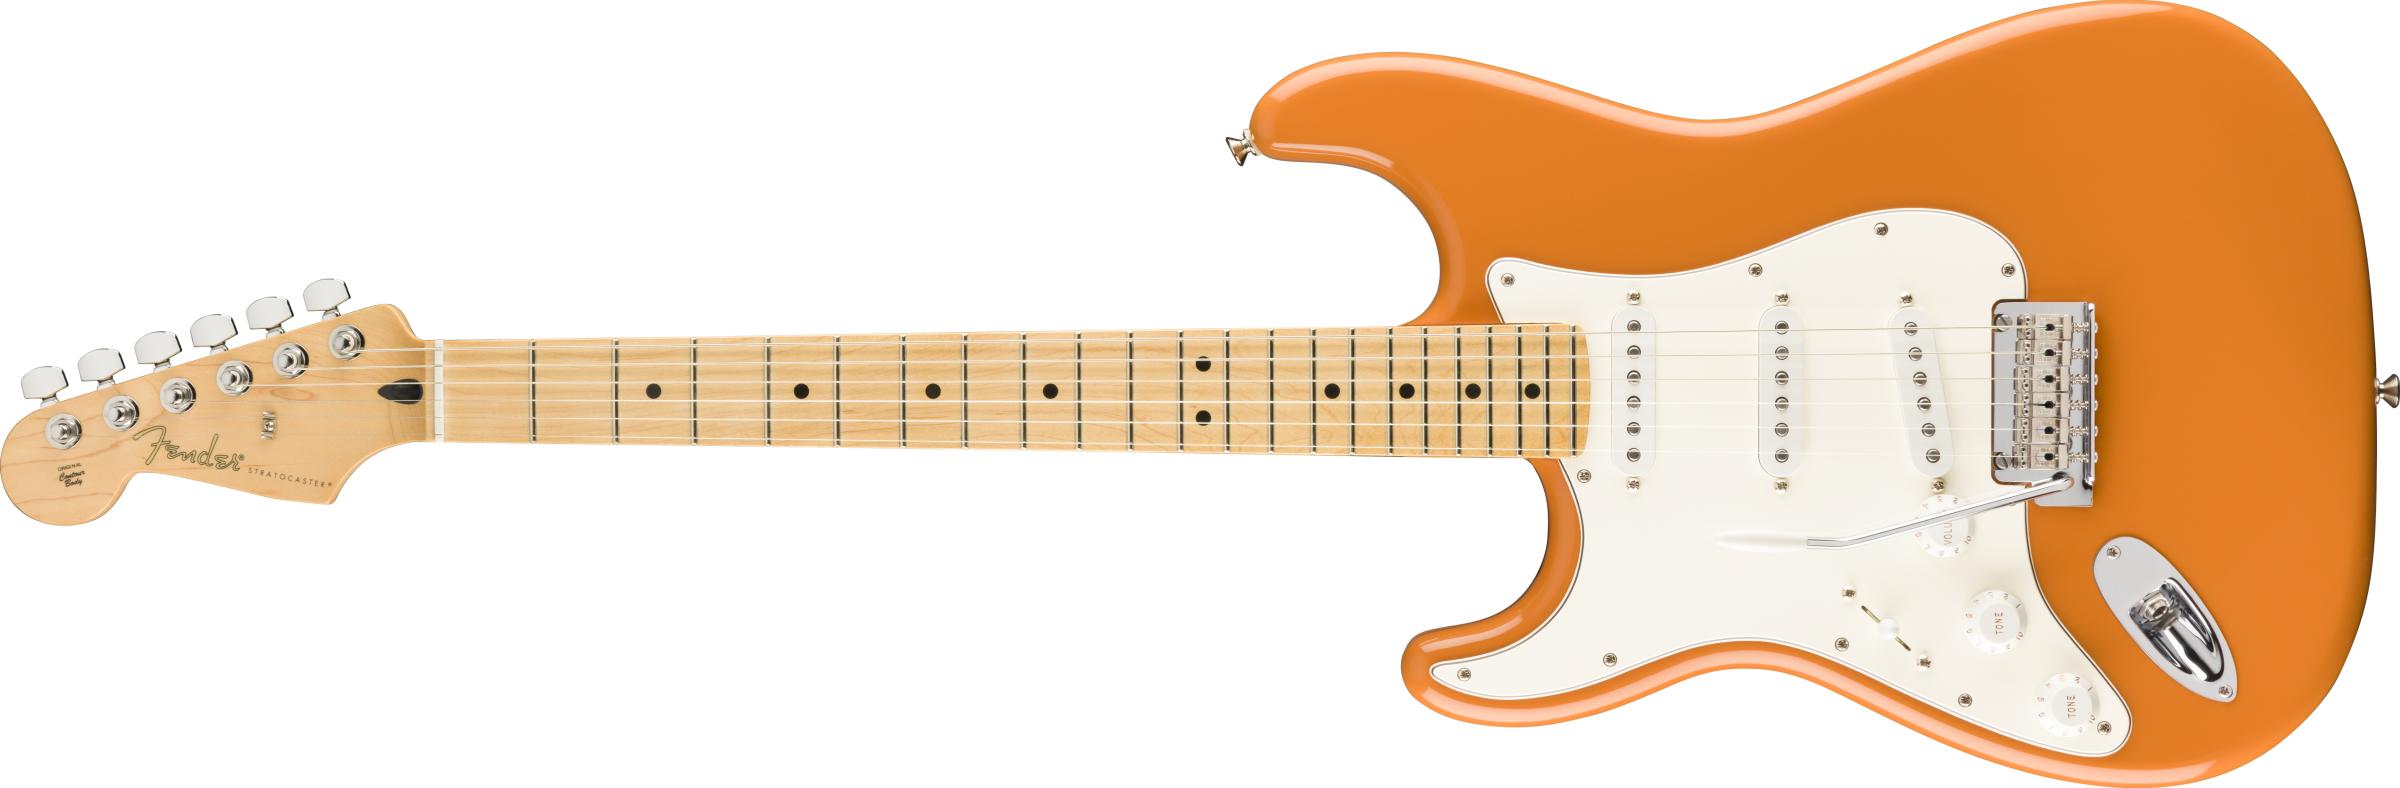 Fender Player Stratocaster® Left-Handed